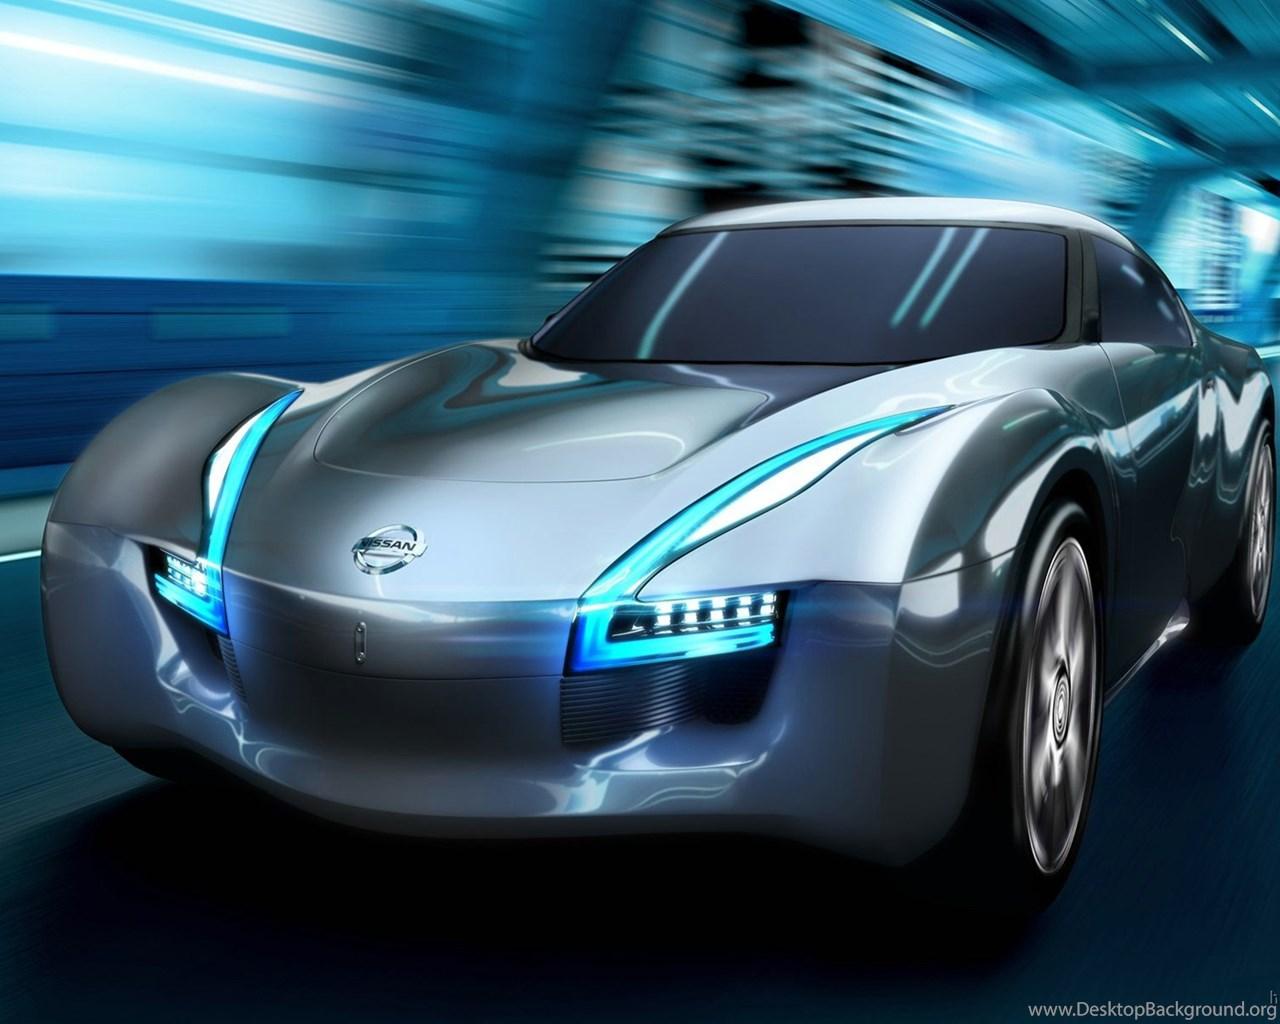 Desktop Sports Cars Images Hd Wallpapers 3d Hd Pictures Desktop